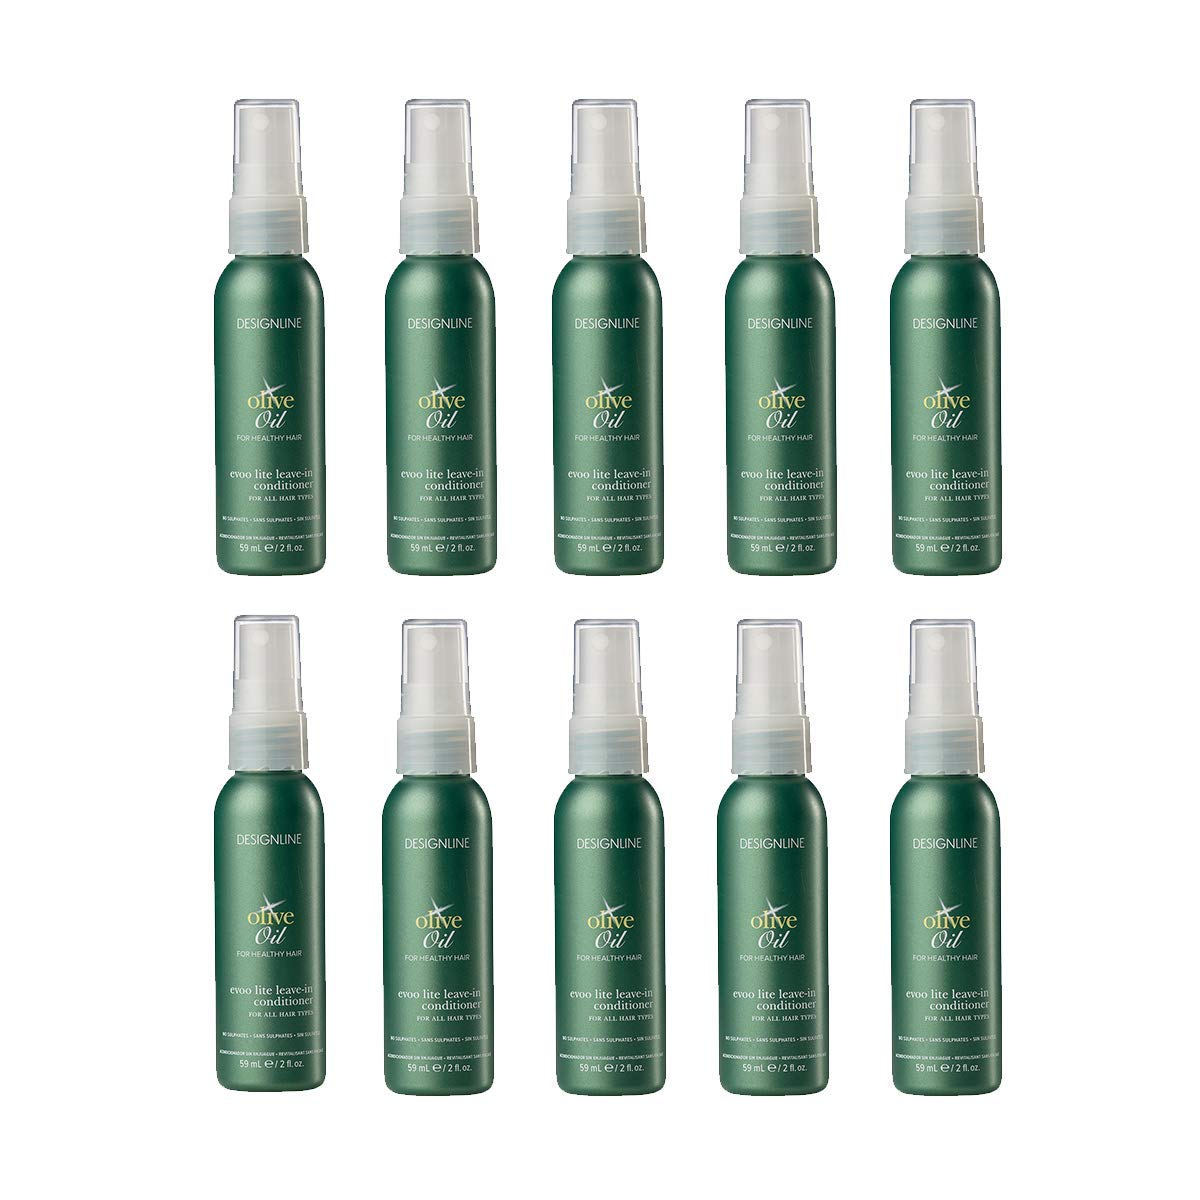 Olive Oil EVOO Cheap bargain Lite Leave-in 2 Inventory cleanup selling sale Regis DESIGNLINE - 10 Pack oz